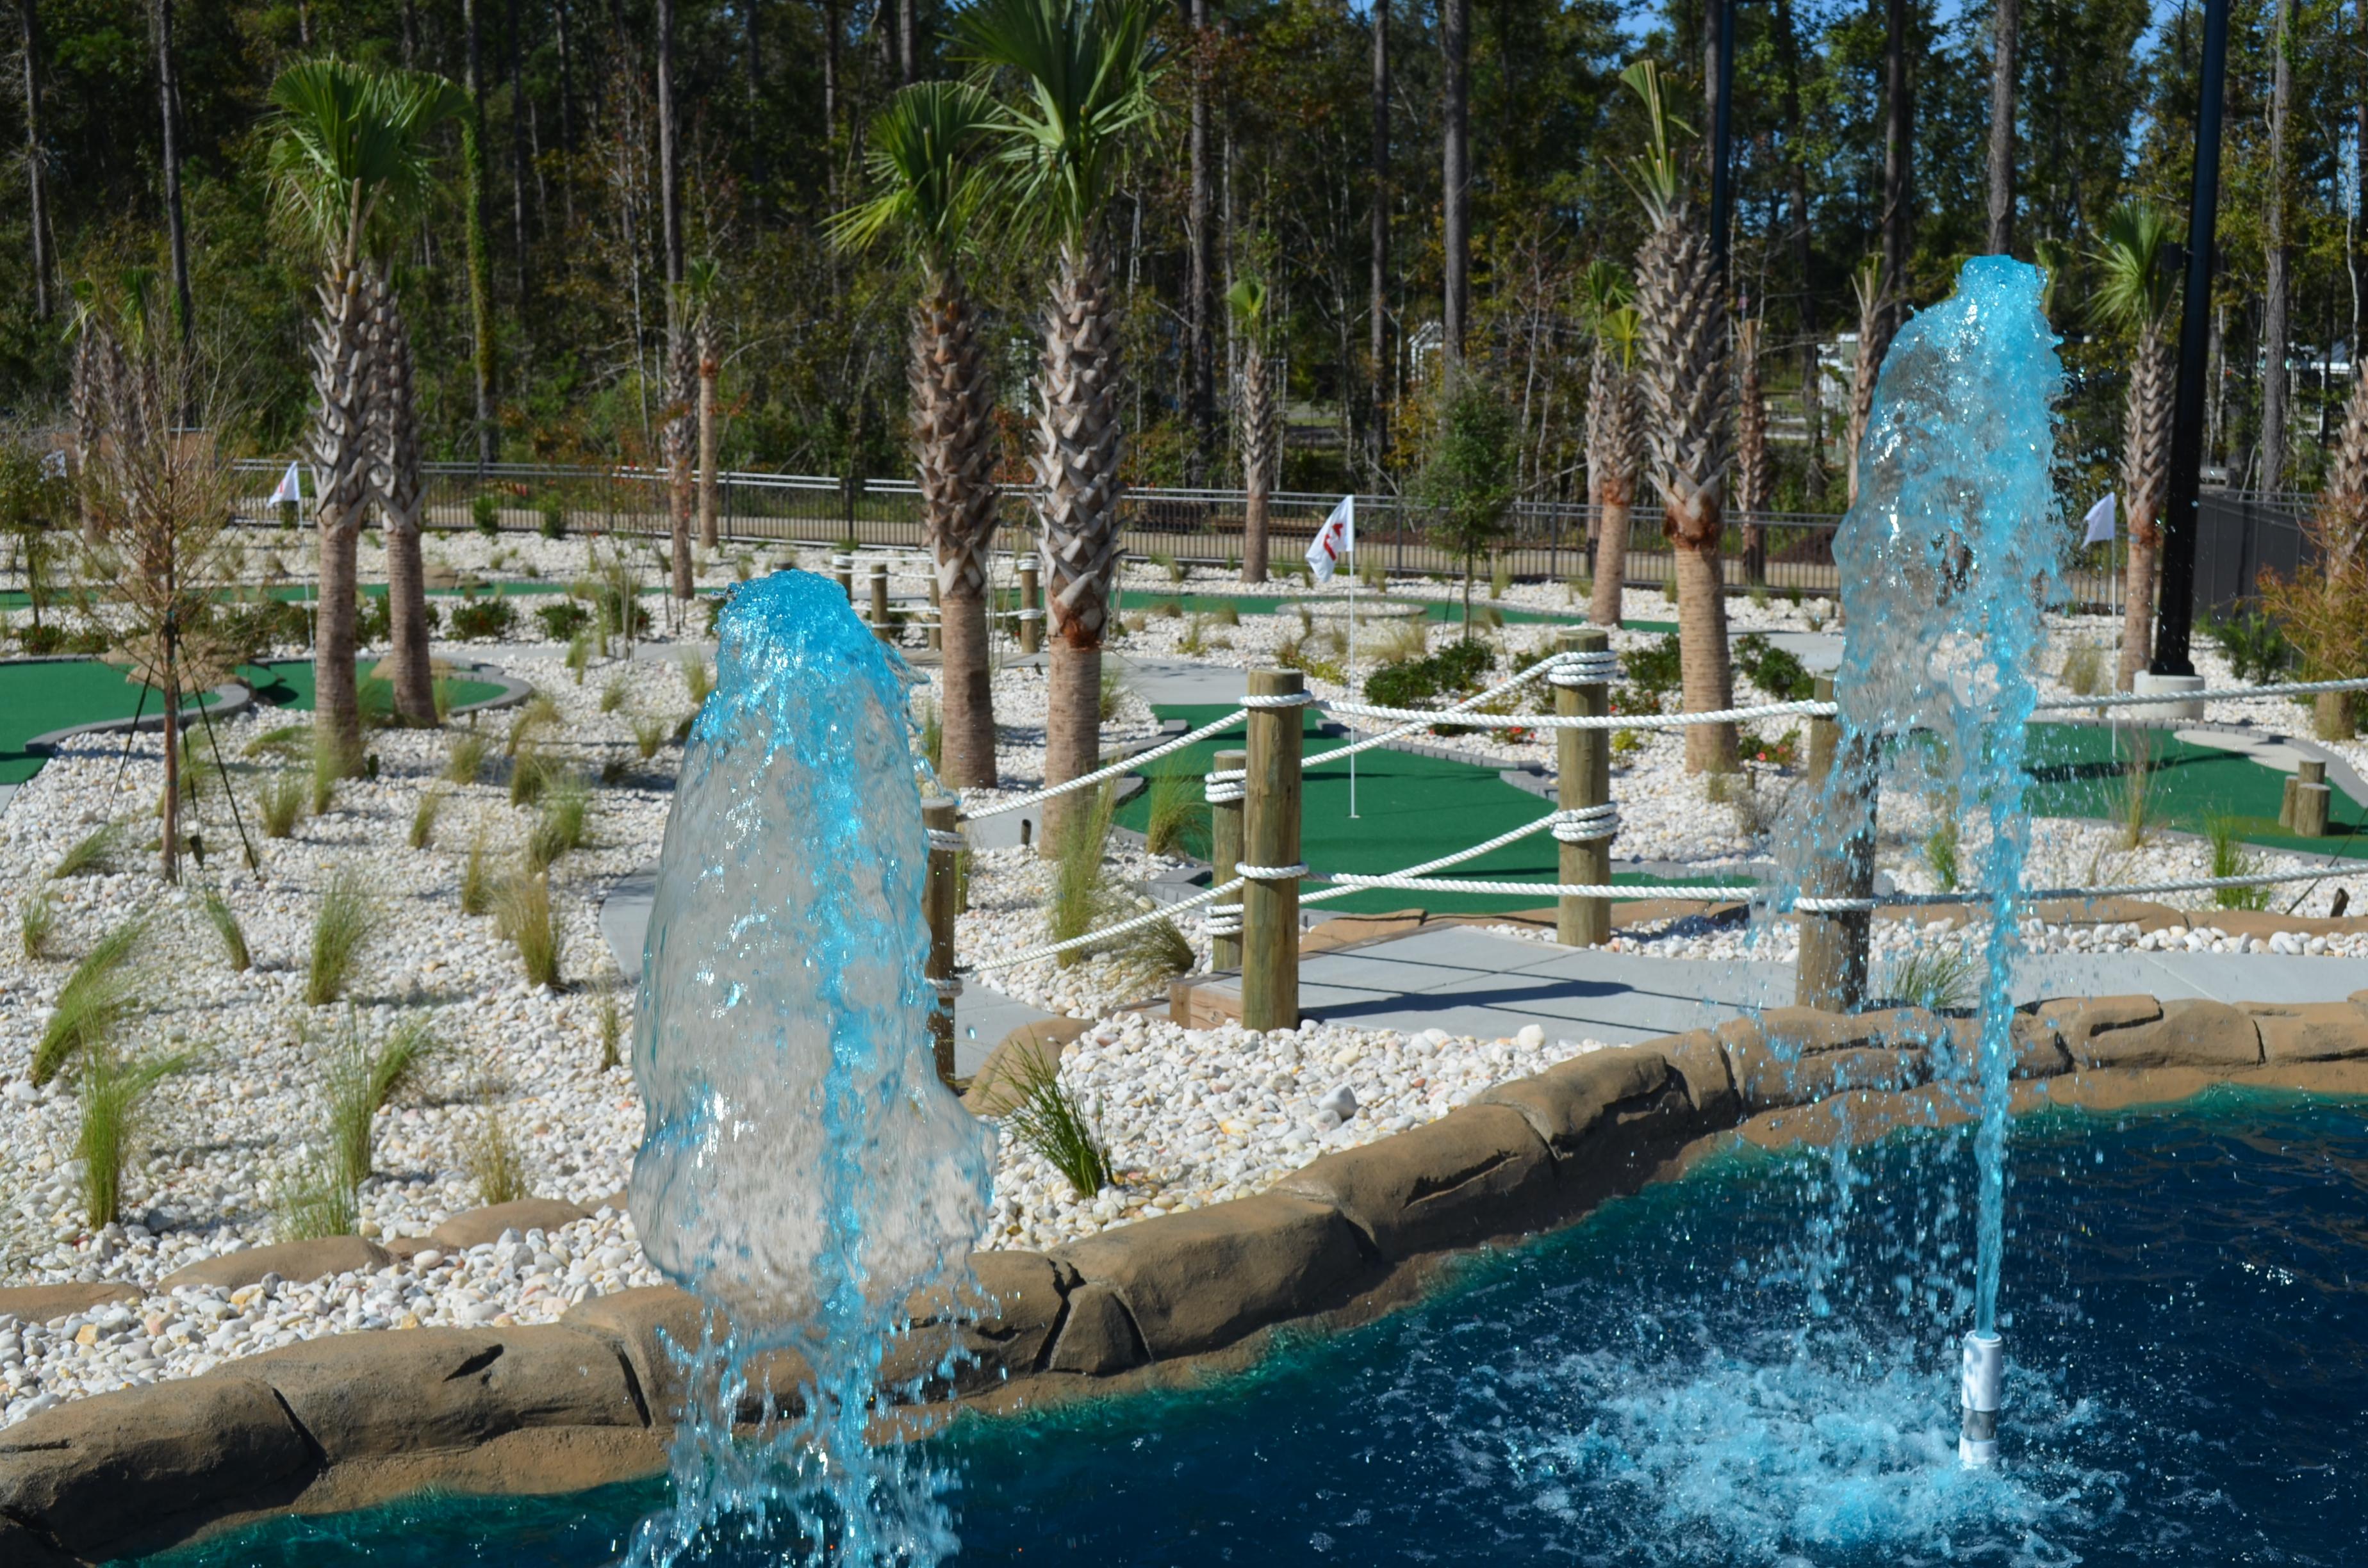 18 hole mini golf course at Carolina Pines RV Resort near Myrtle Beach, South Carolina